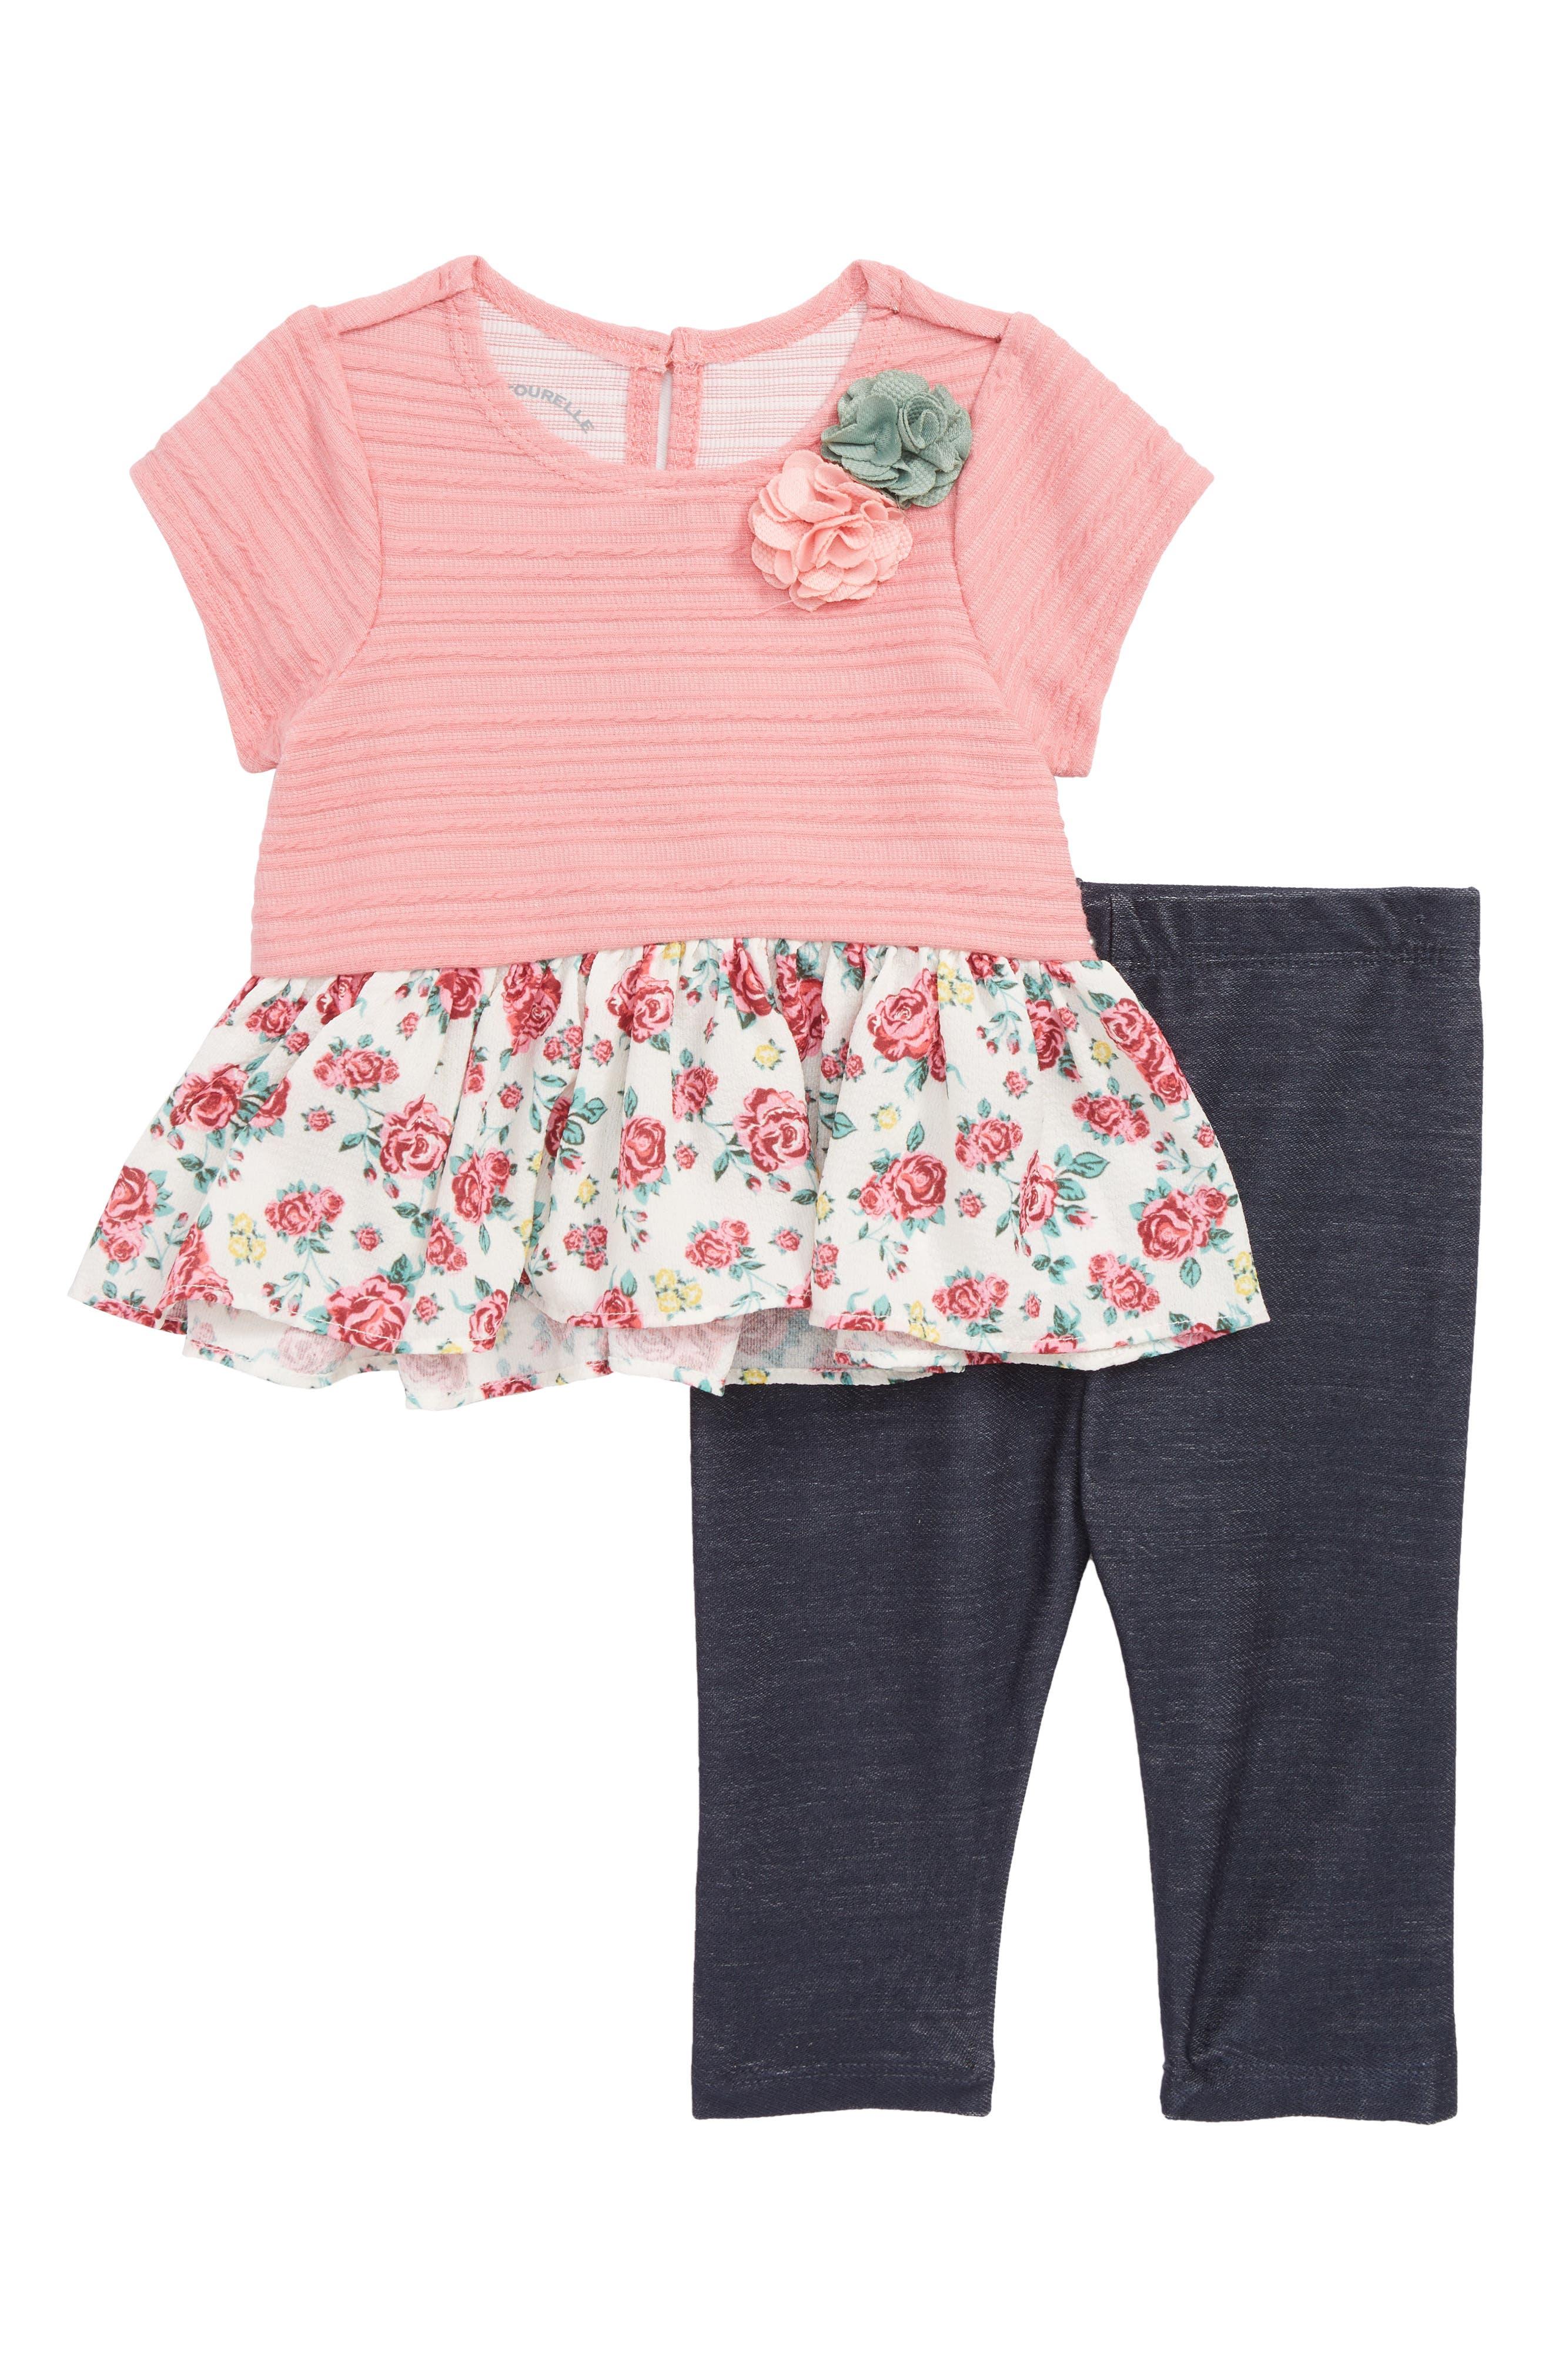 Floral Peplum Dress & Leggings Set,                             Main thumbnail 1, color,                             Pink